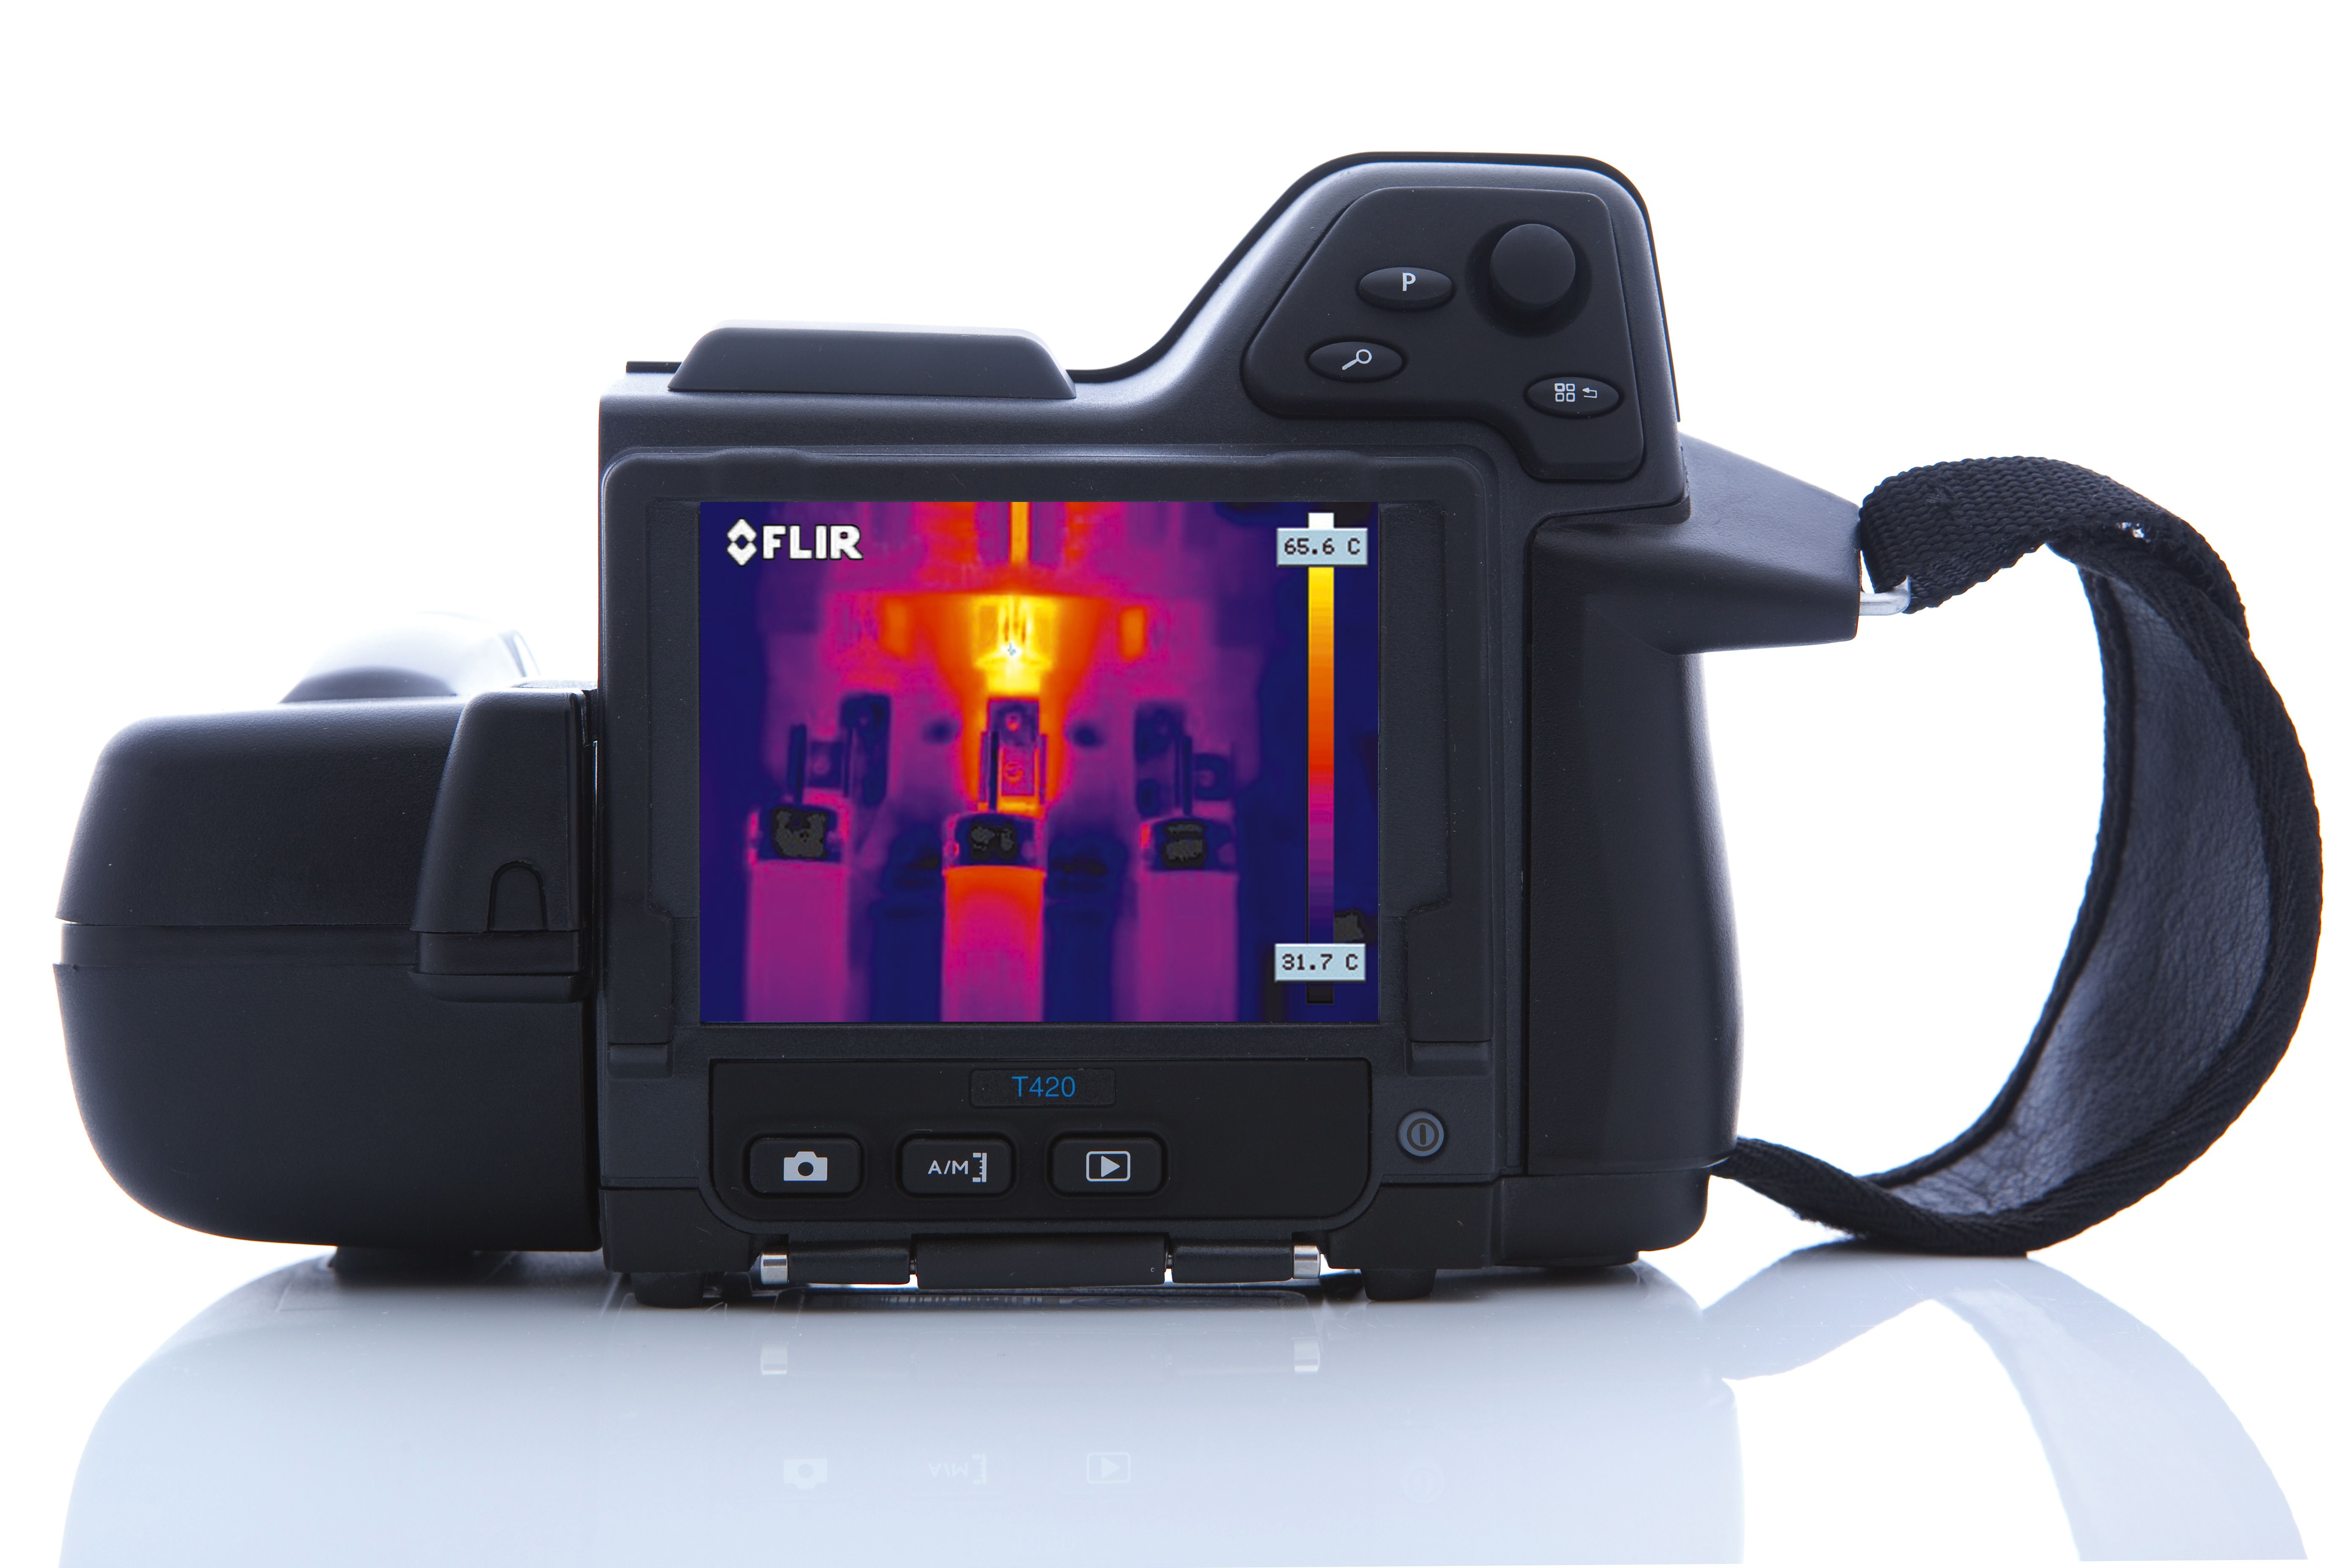 Flir T420bx T 420 bx Thermal Imaging Infrared Camera